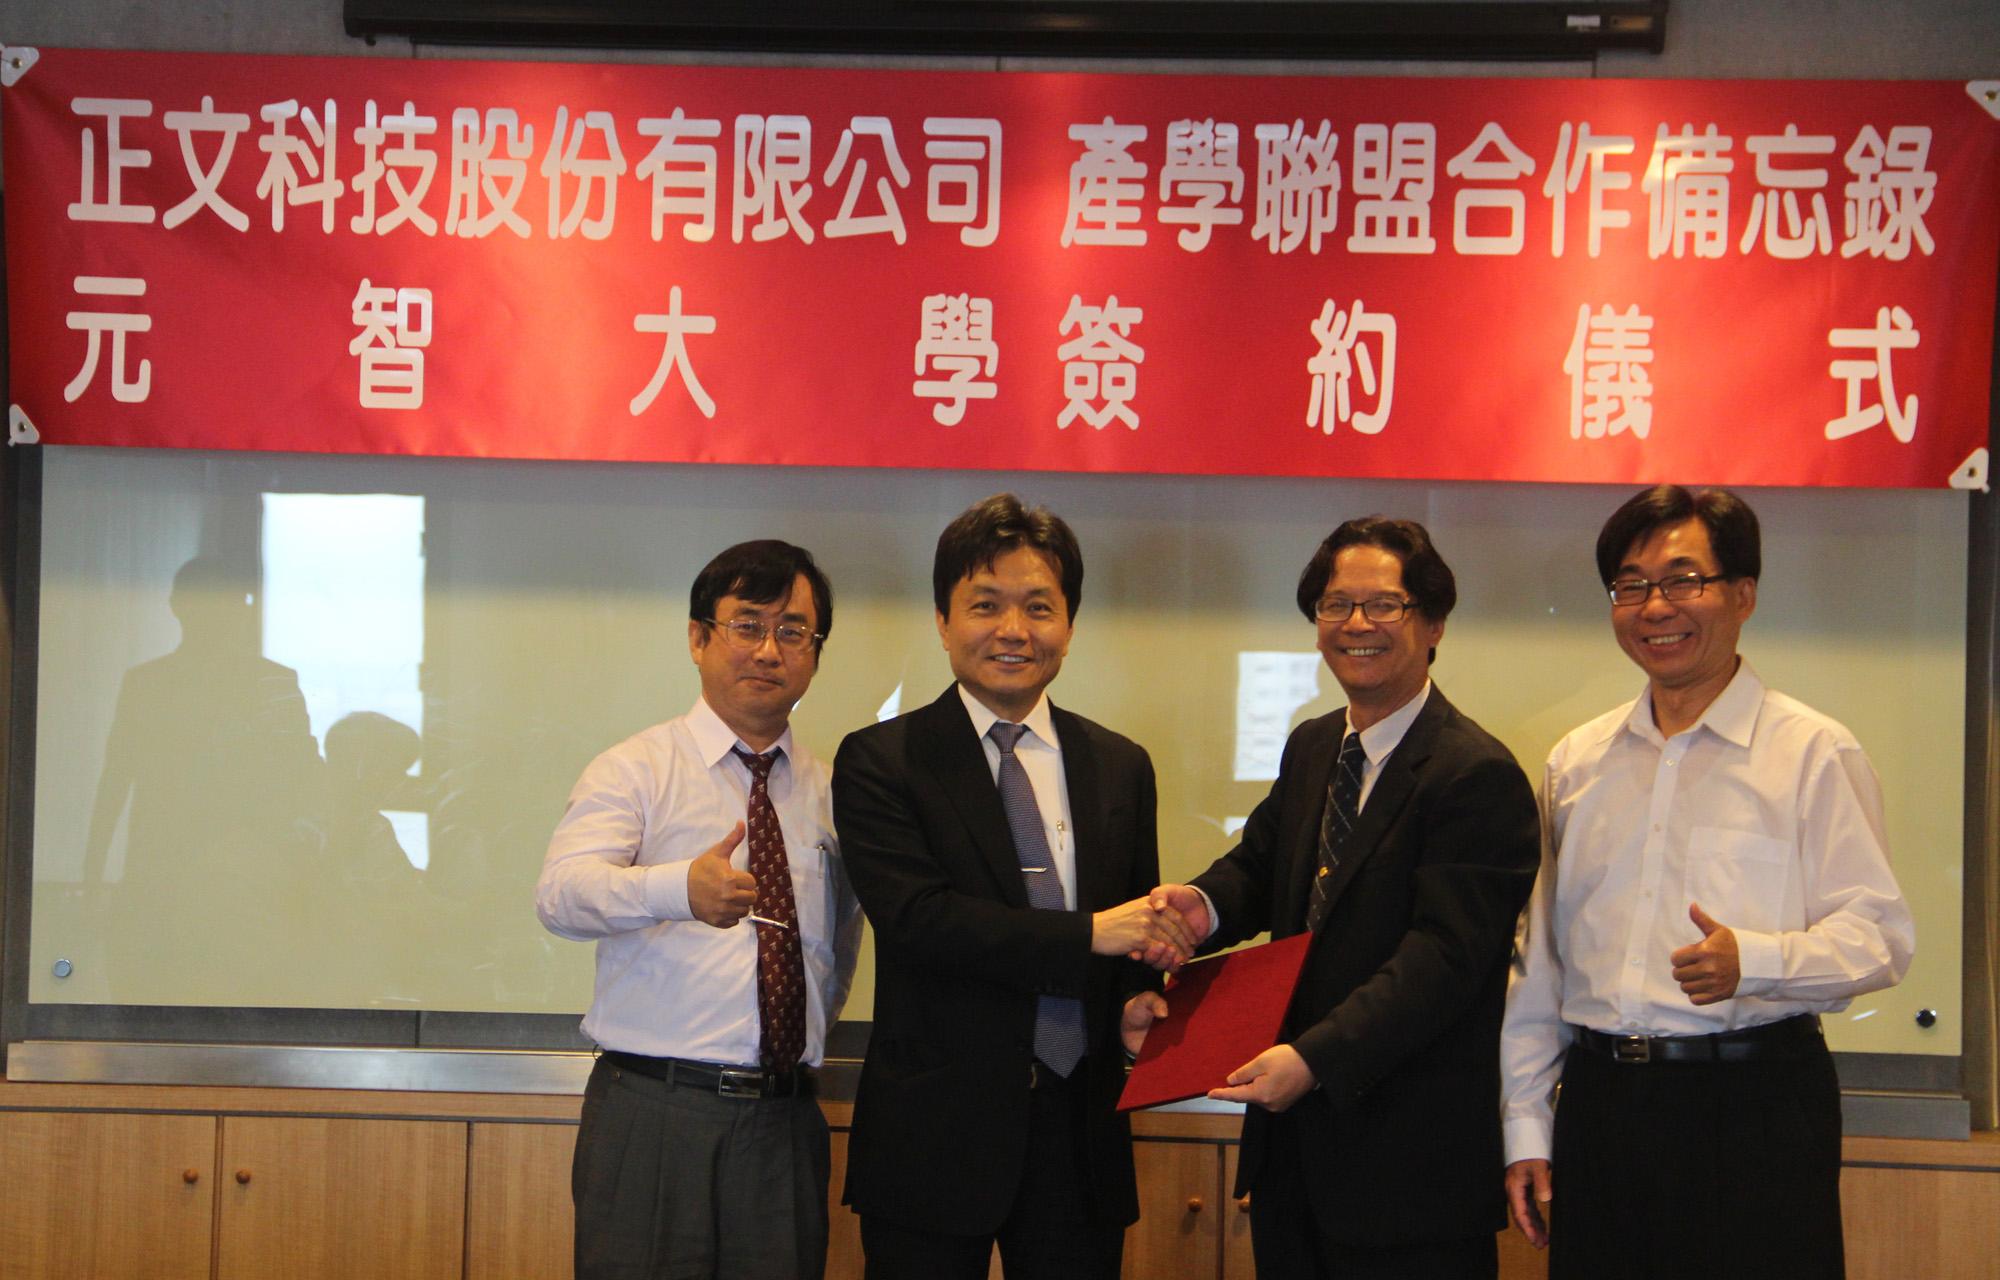 YZU and Gemtak sign the university-enterprise MOU